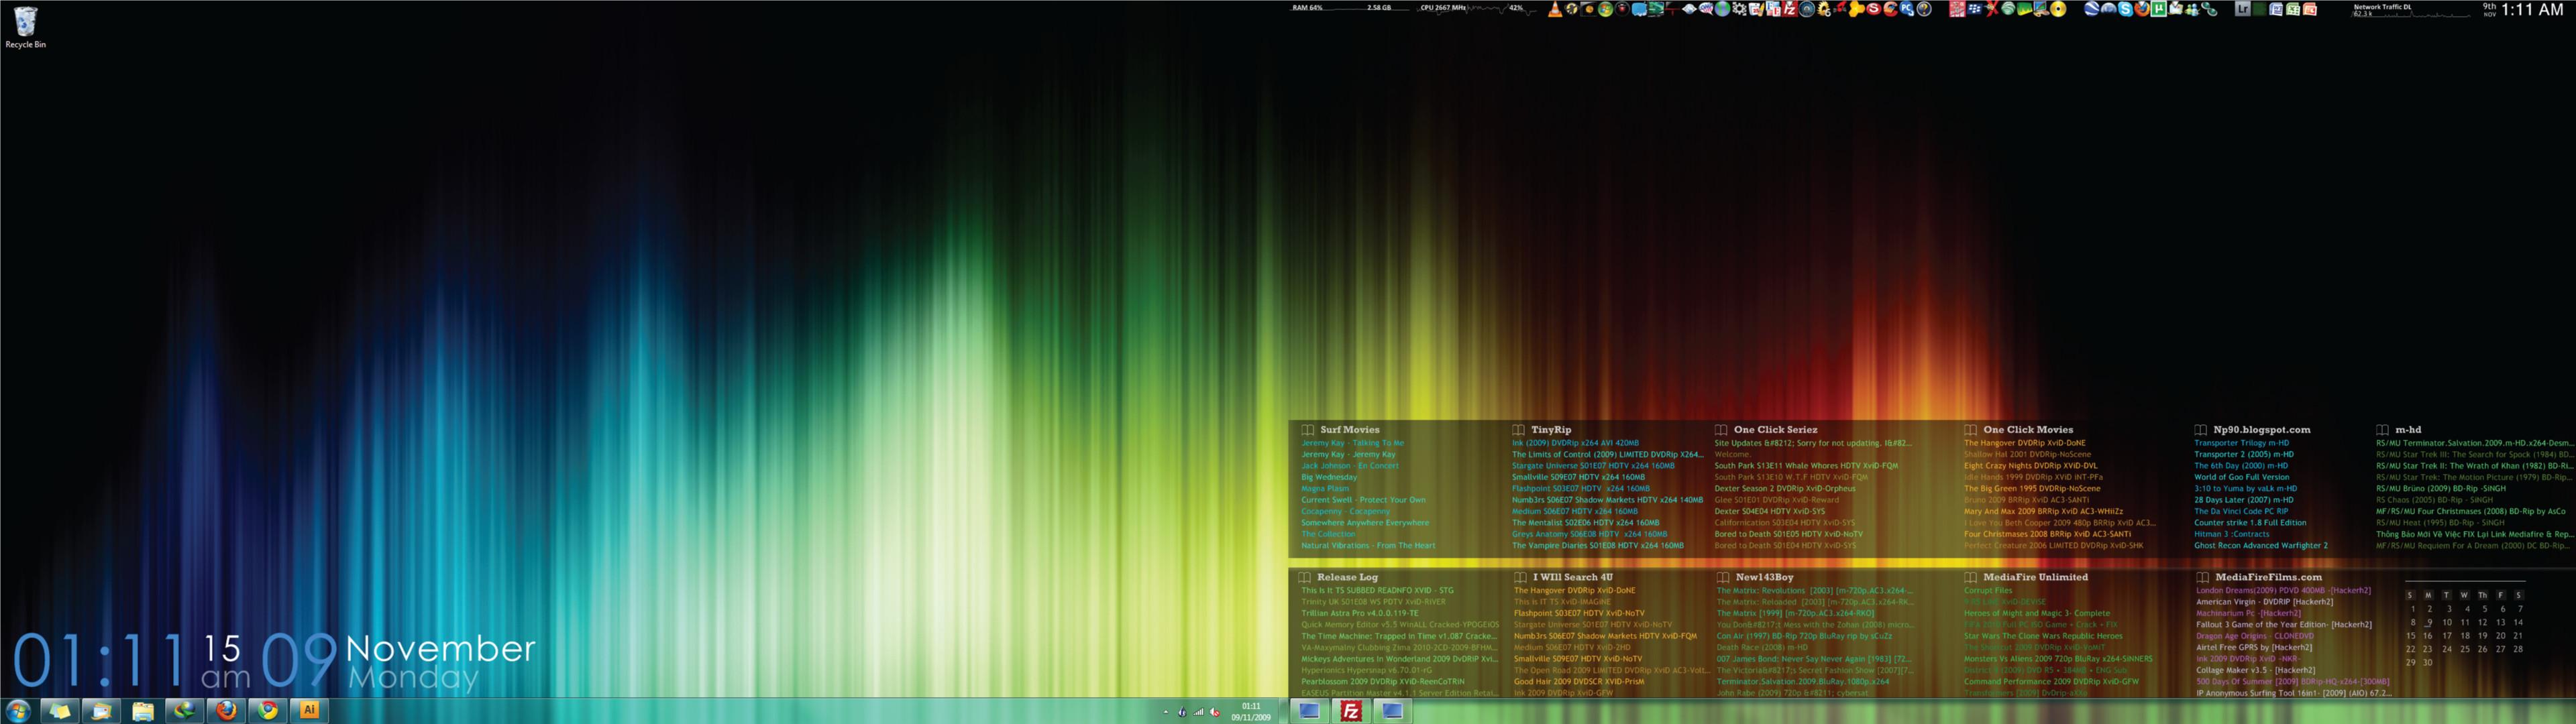 dual monitor wallpaper windows 7